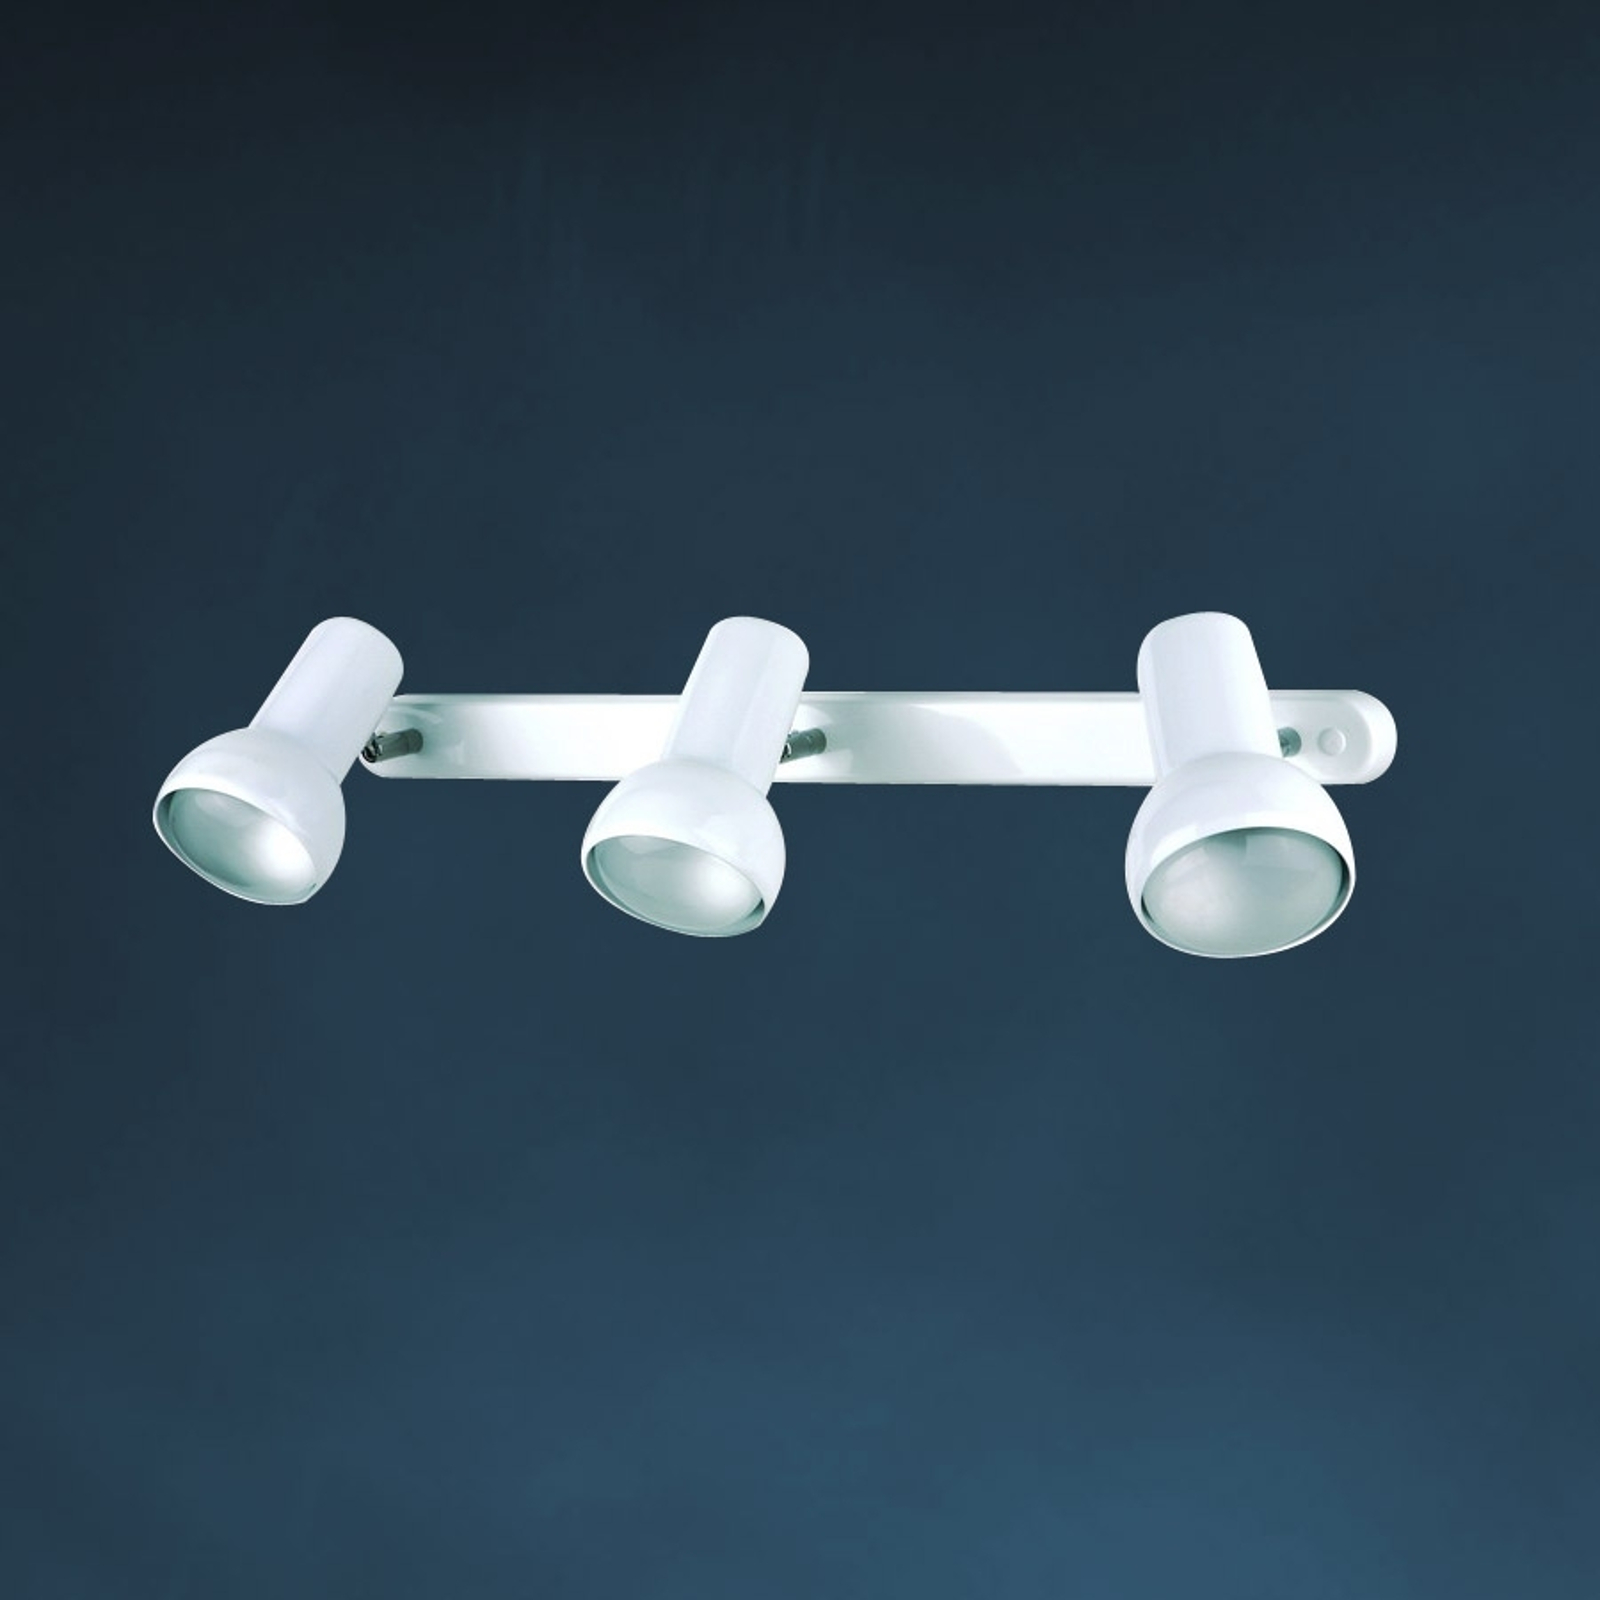 Vegglampe EIFEL, 3 lysilder